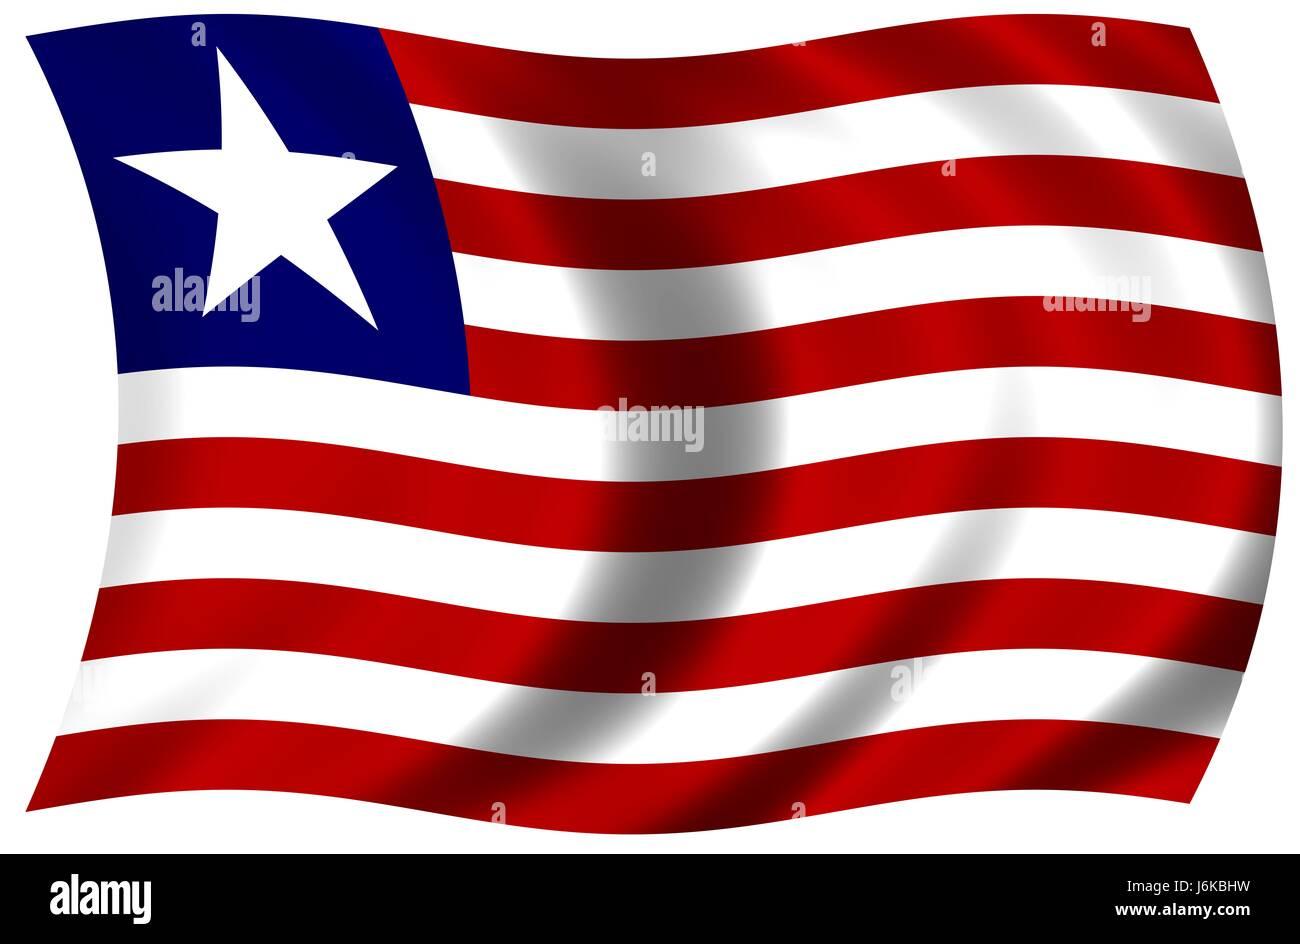 national flag of liberia - Stock Image